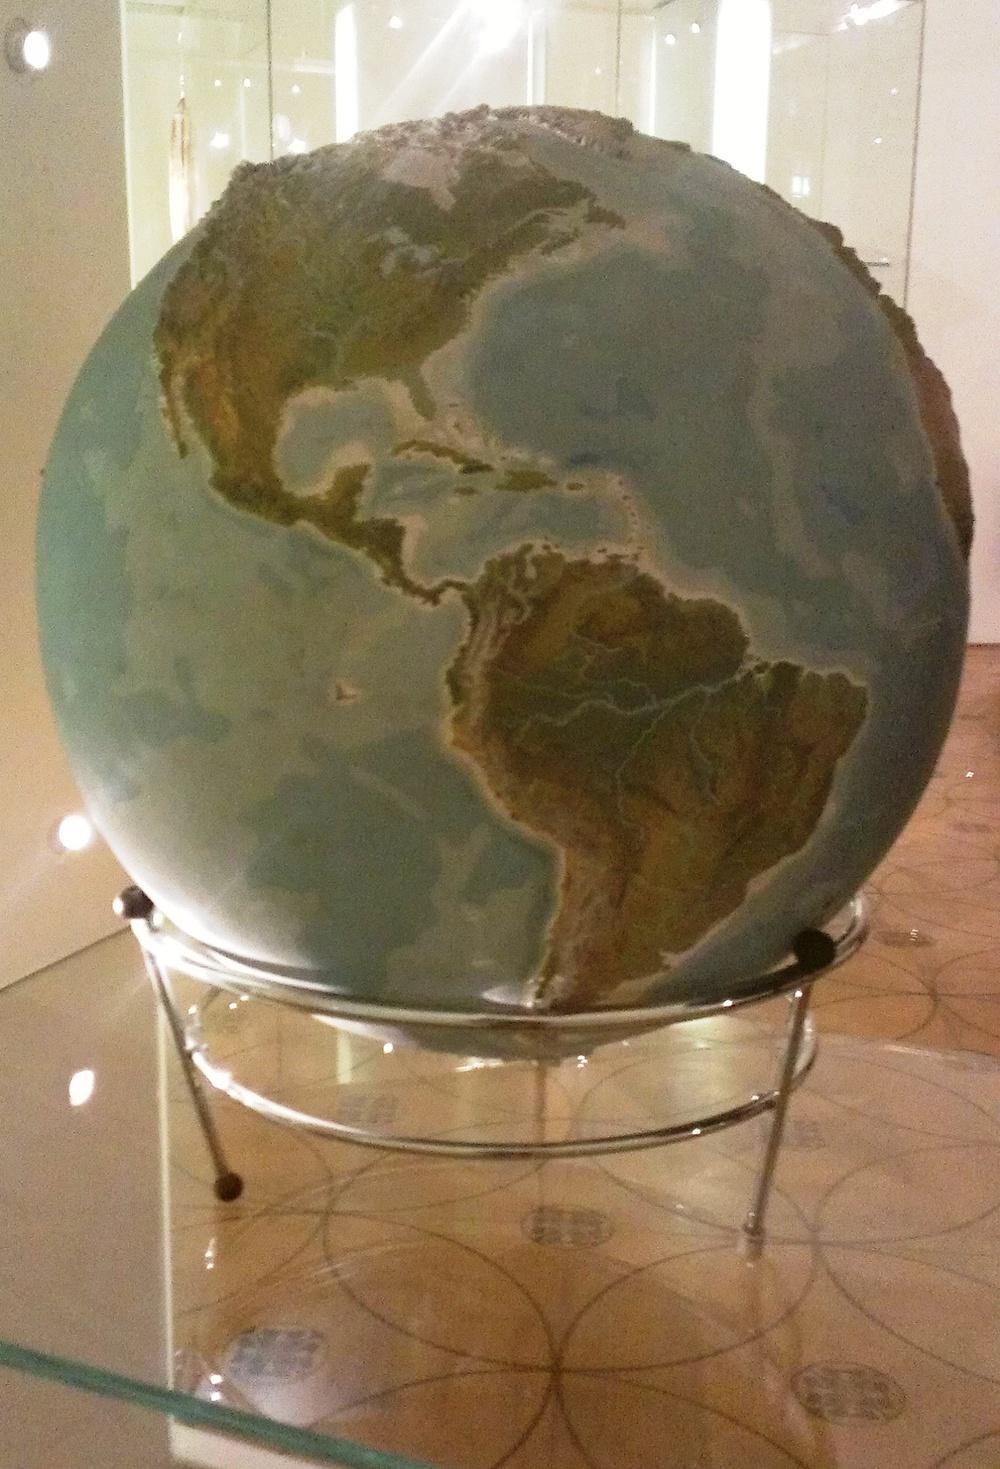 Topography globe